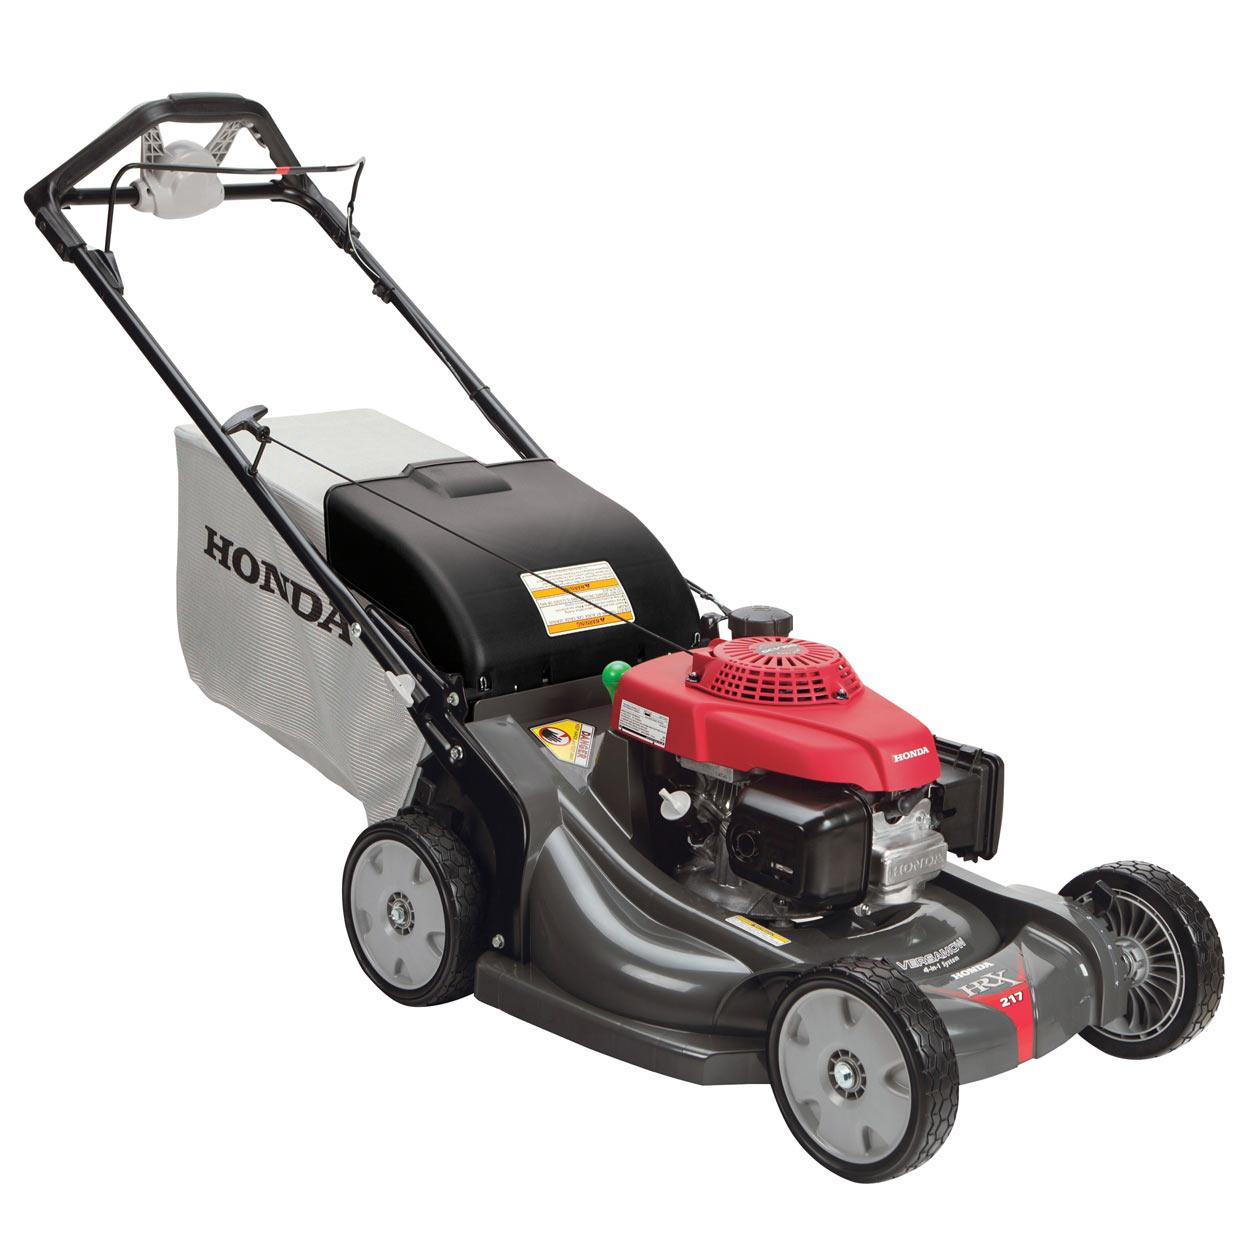 Honda Gx340 Engine Parts And Diagram Lawn Mower Parts Lawn